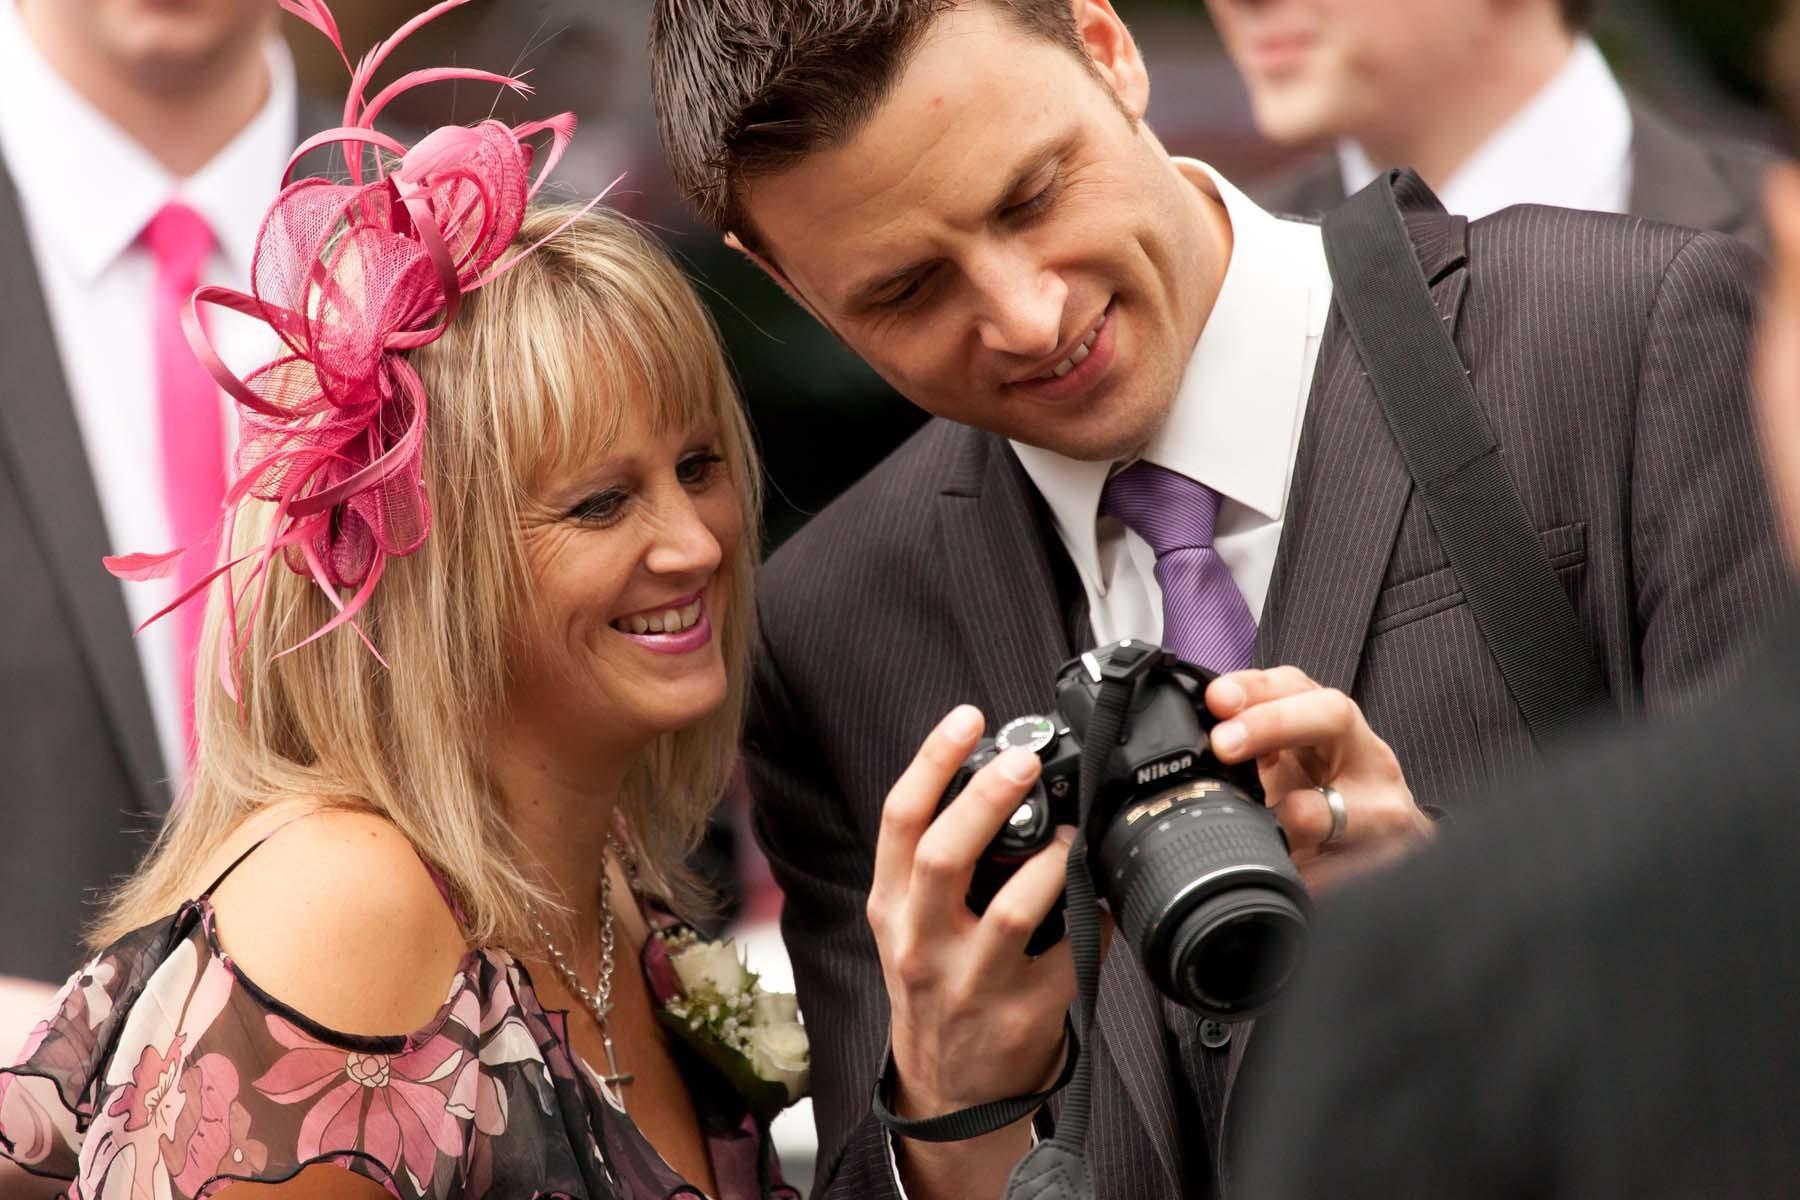 Sussex & Surrey Wedding Photographer - Guests & Groups (19)